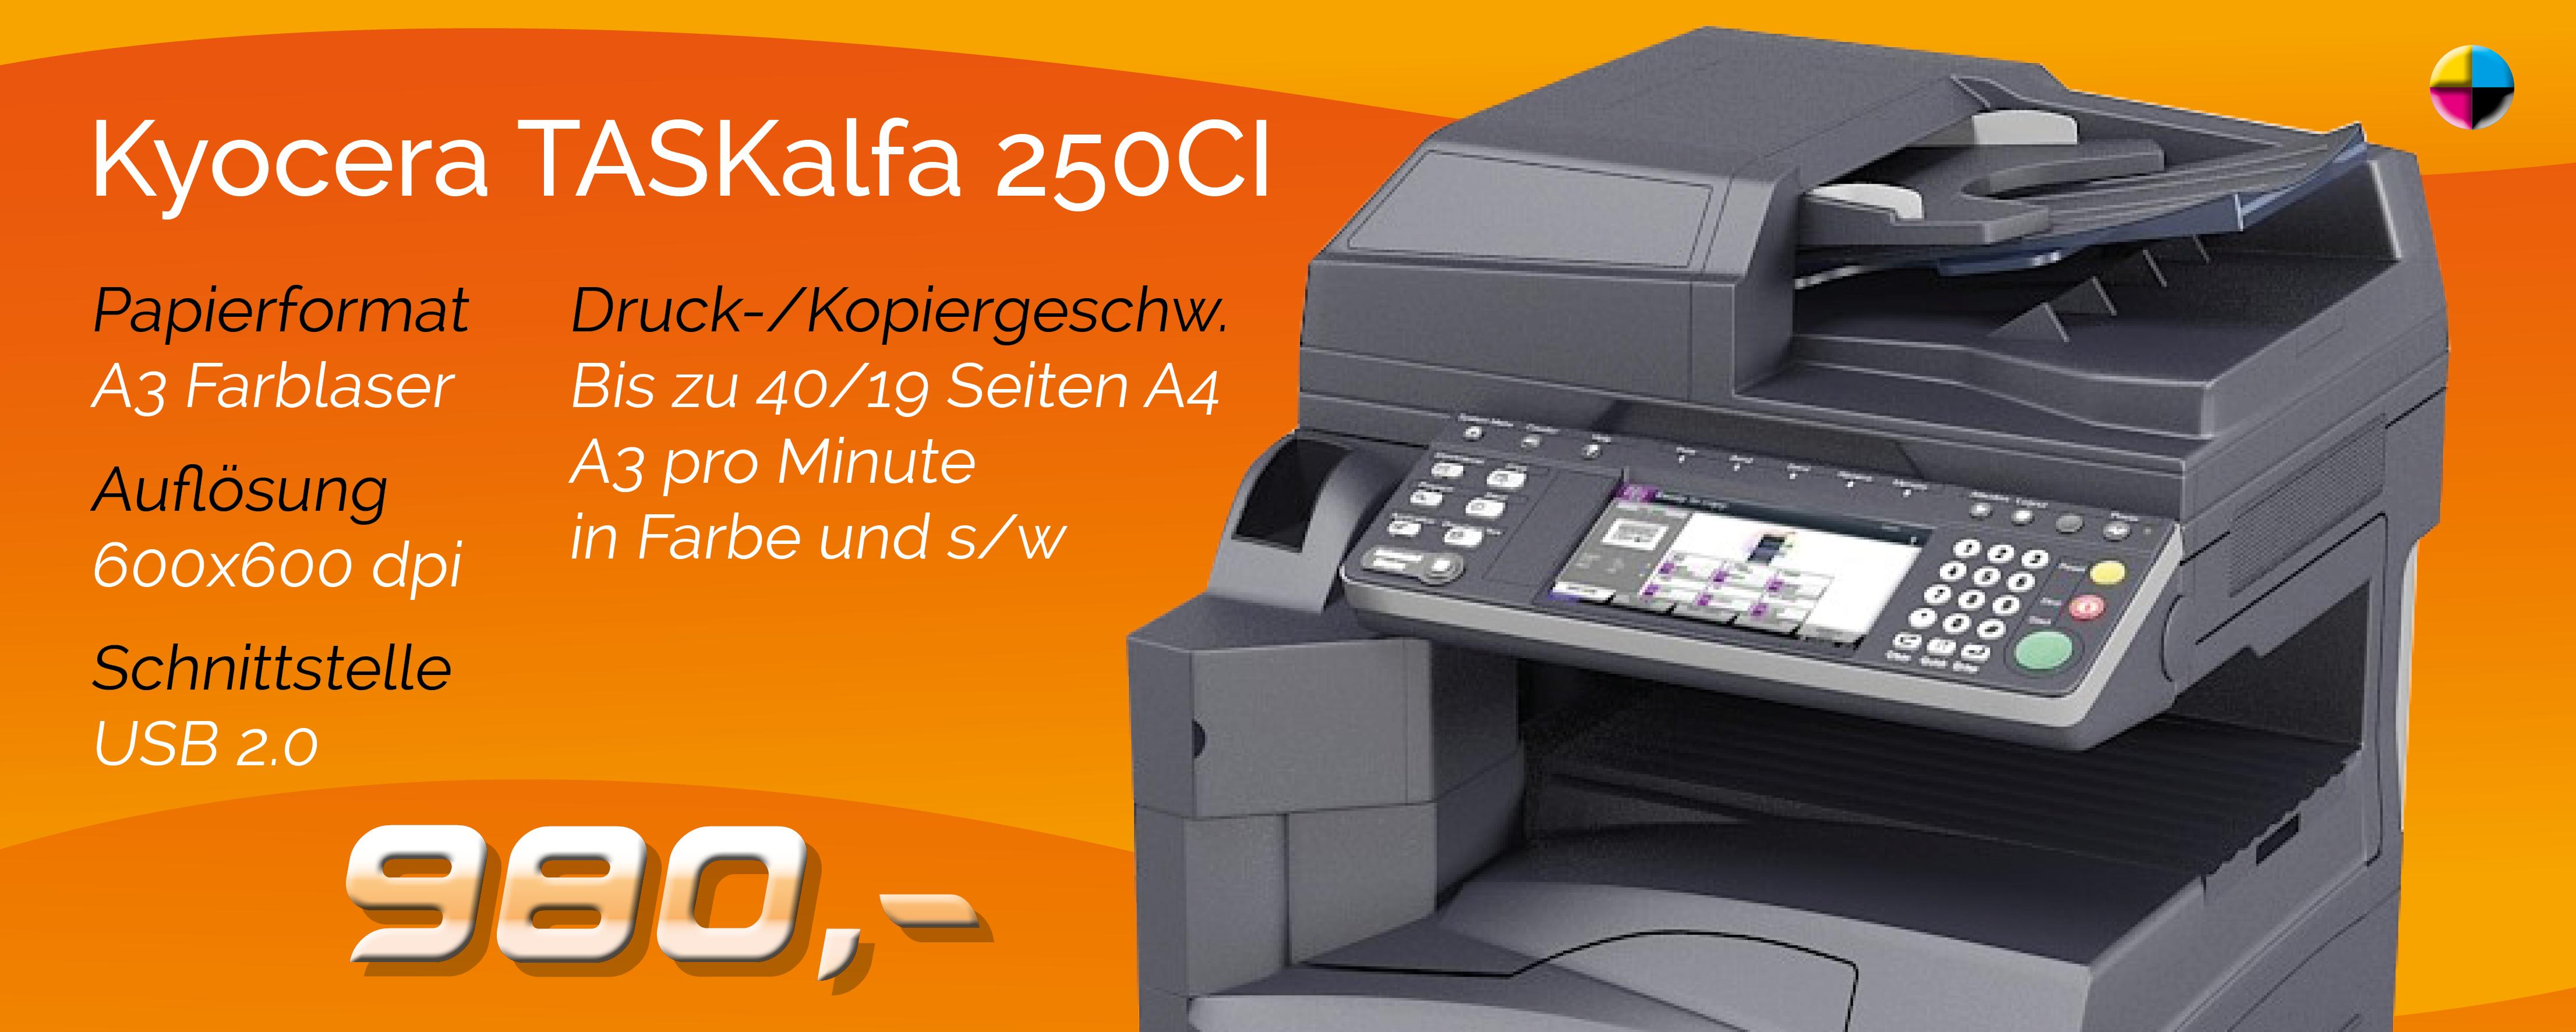 Angebot Kyocera TASKalfa 250ci